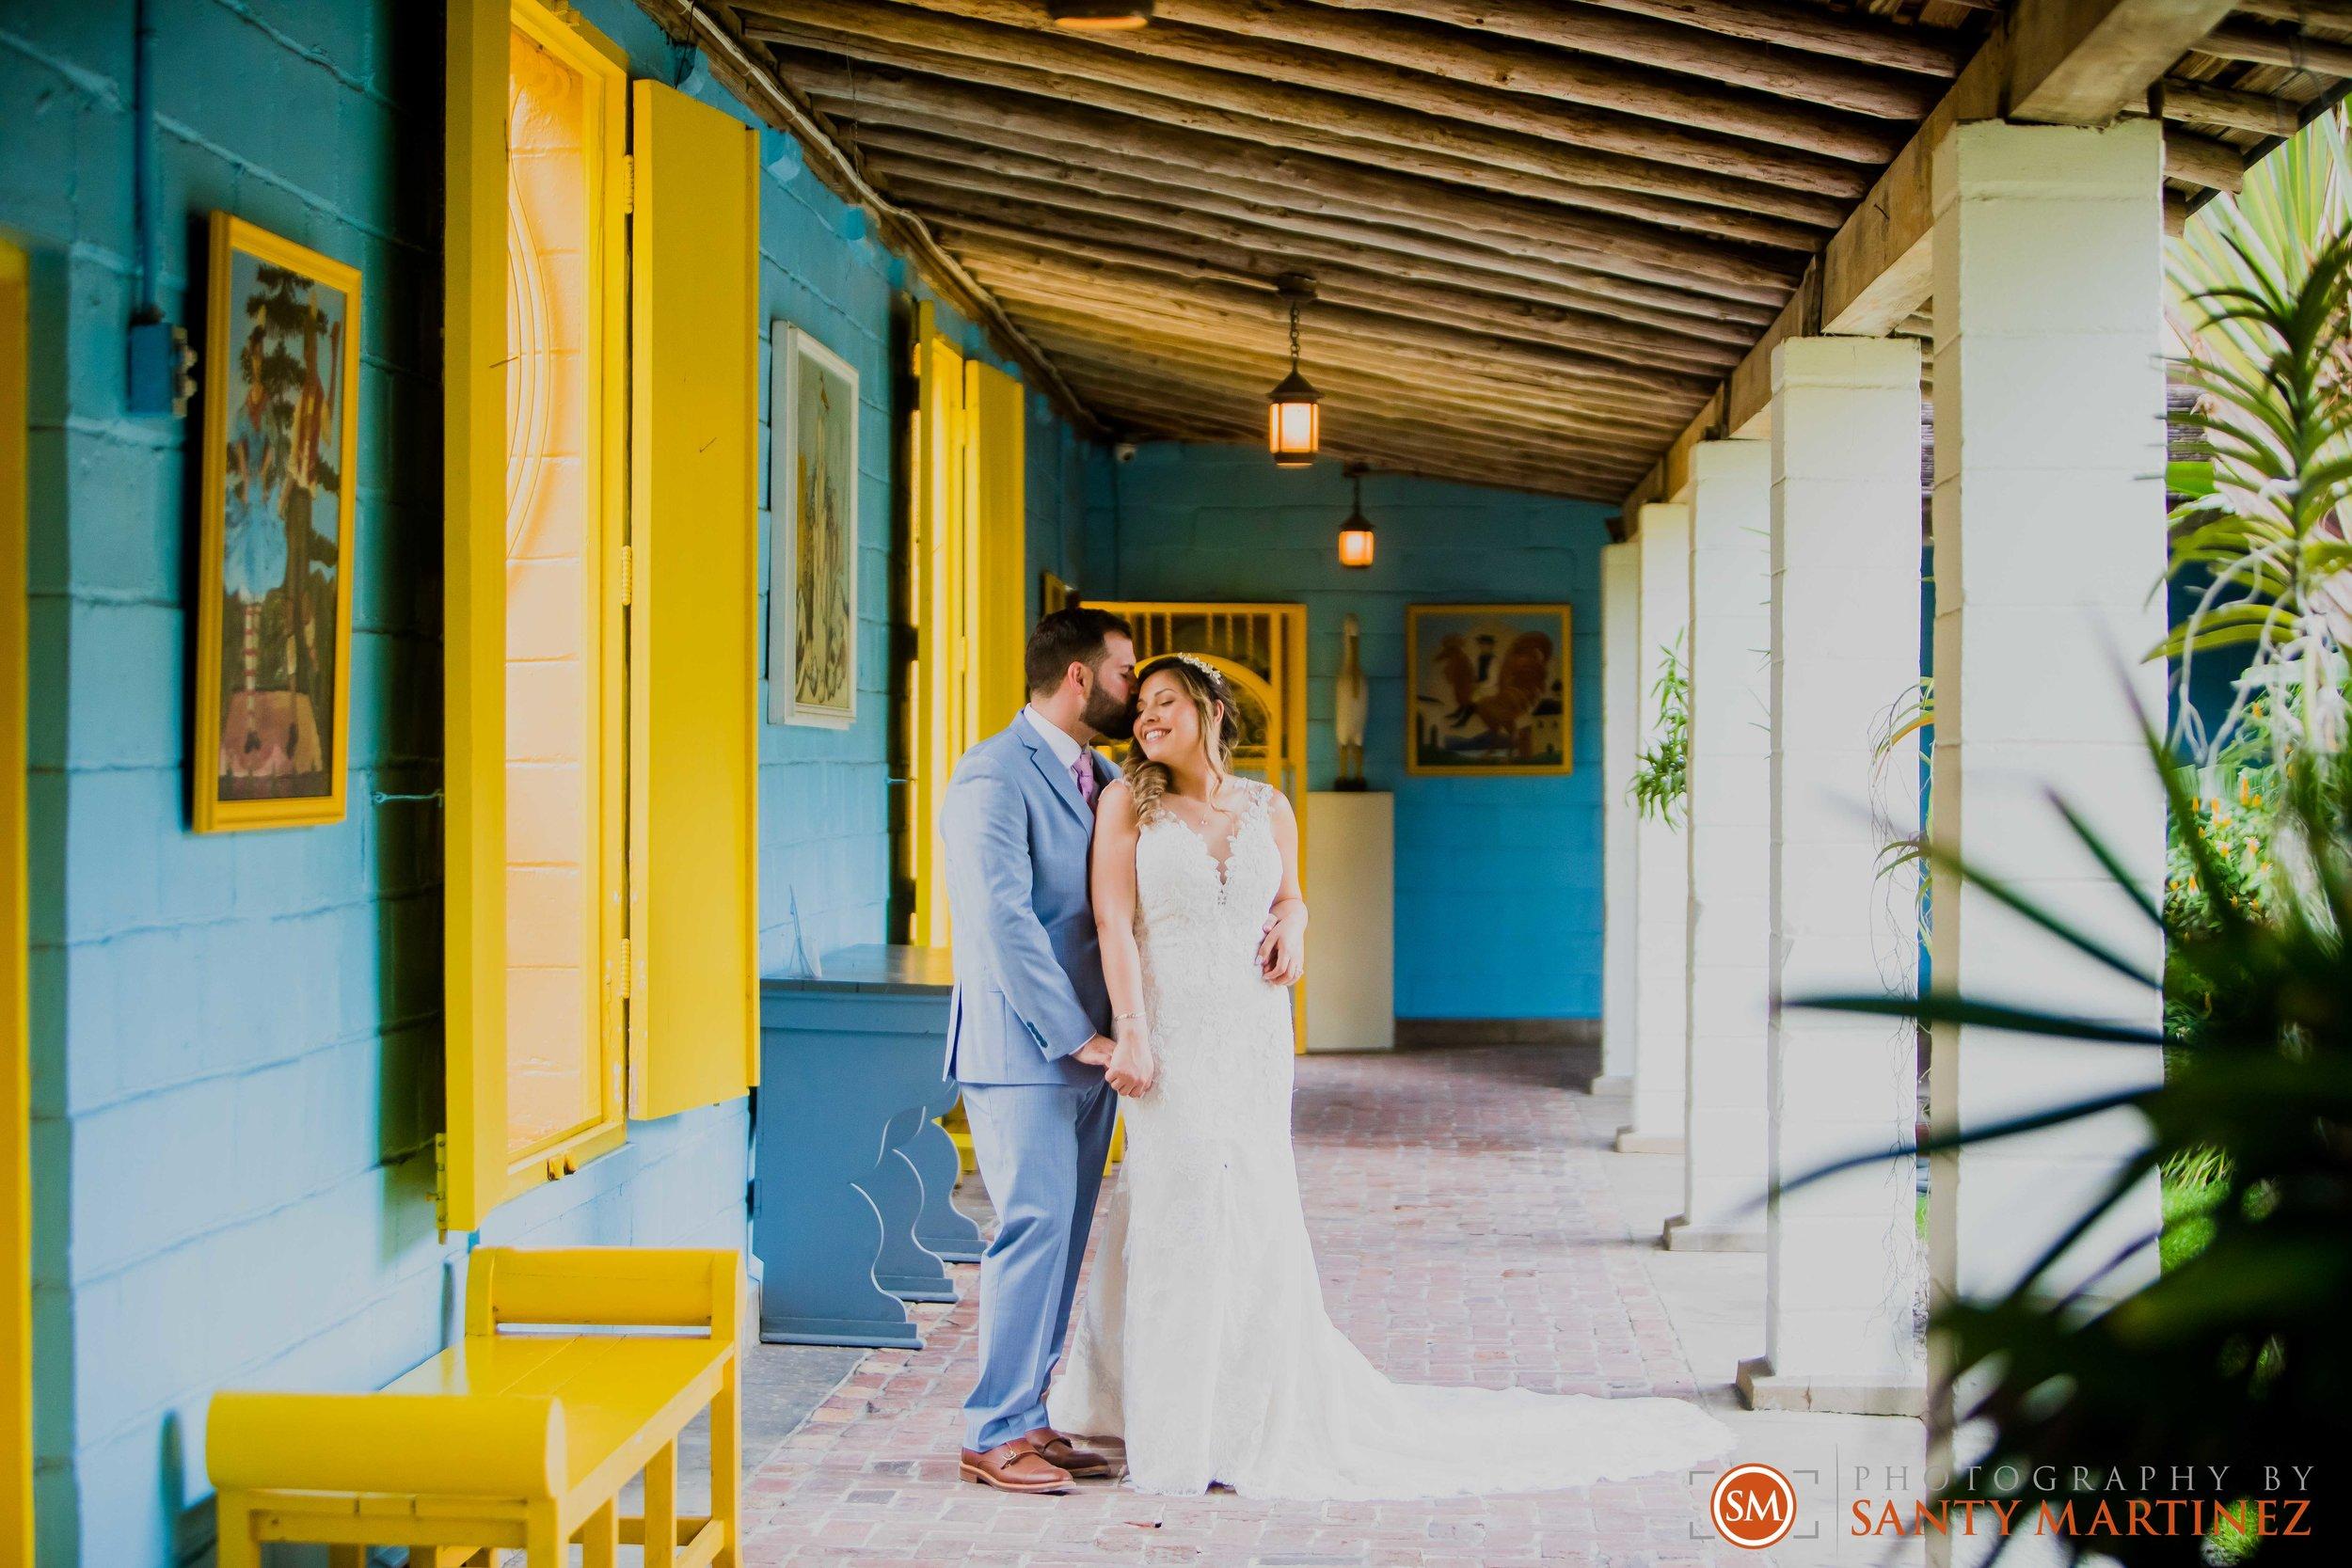 Wedding Bonnet House - Santy Martinez Photography-19.jpg